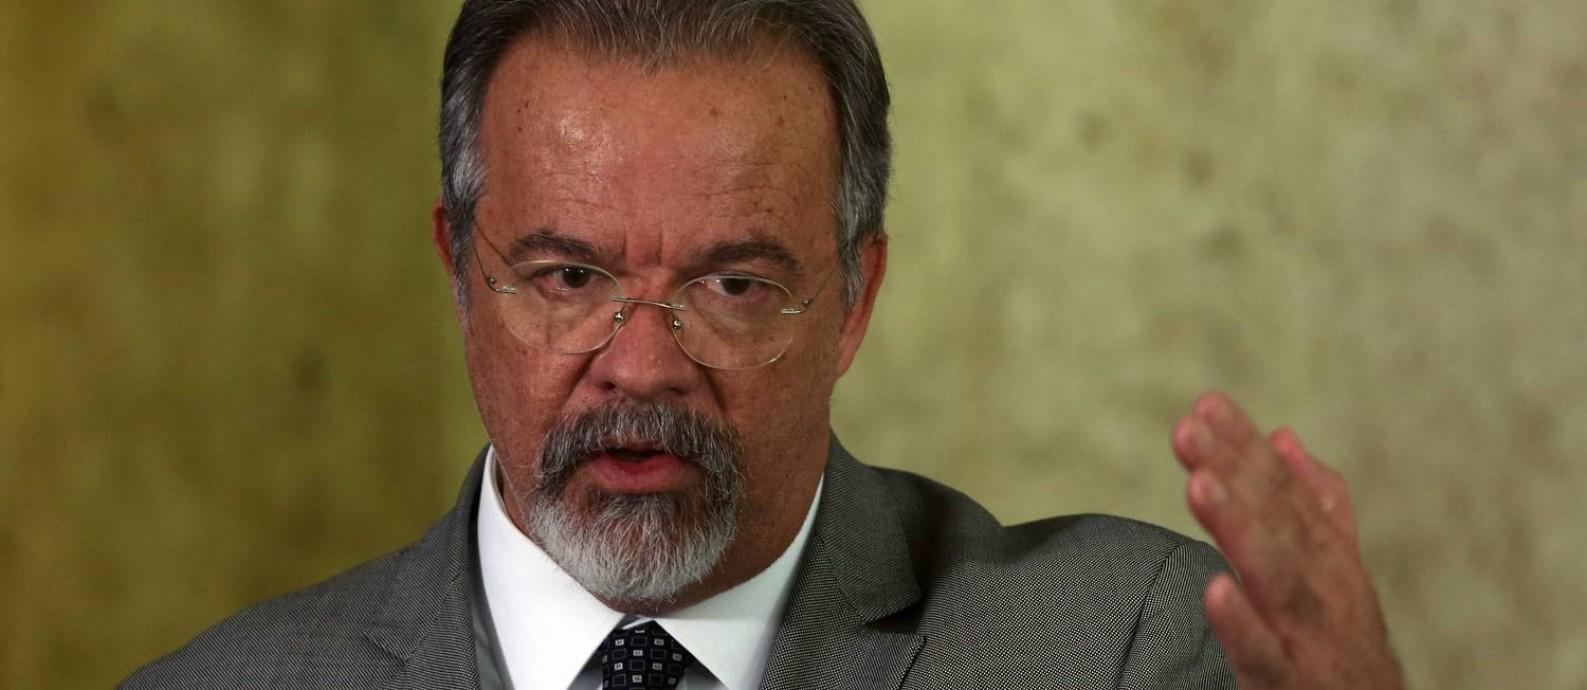 O ministro da Defesa, Raul Jungmann, fala sobre o confronto na Rocinha Foto: Givaldo Barbosa / Agência O Globo